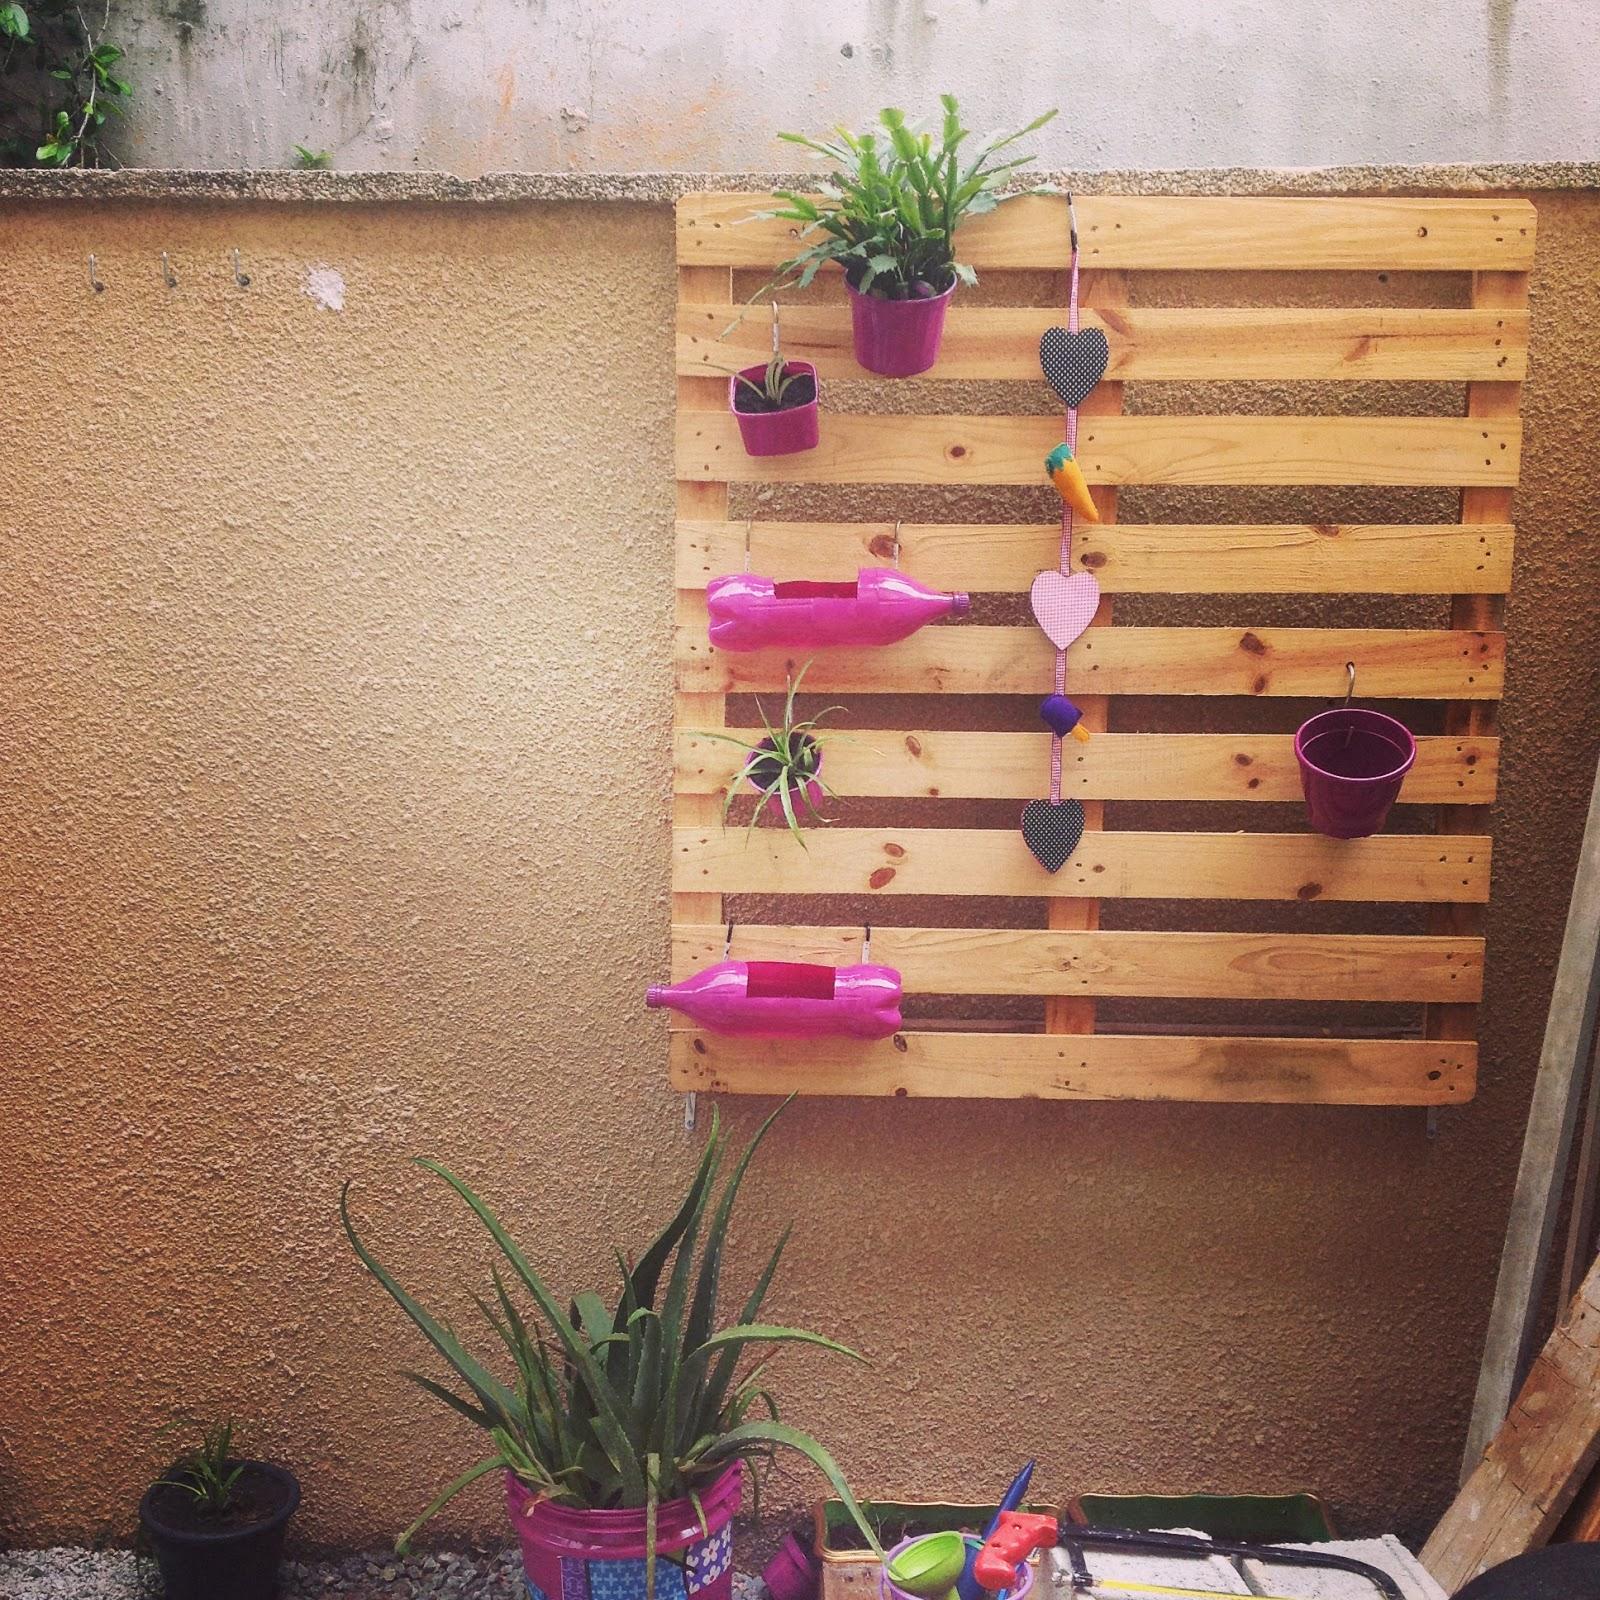 jardim vertical no sol:Jardim Vertical com Pallet